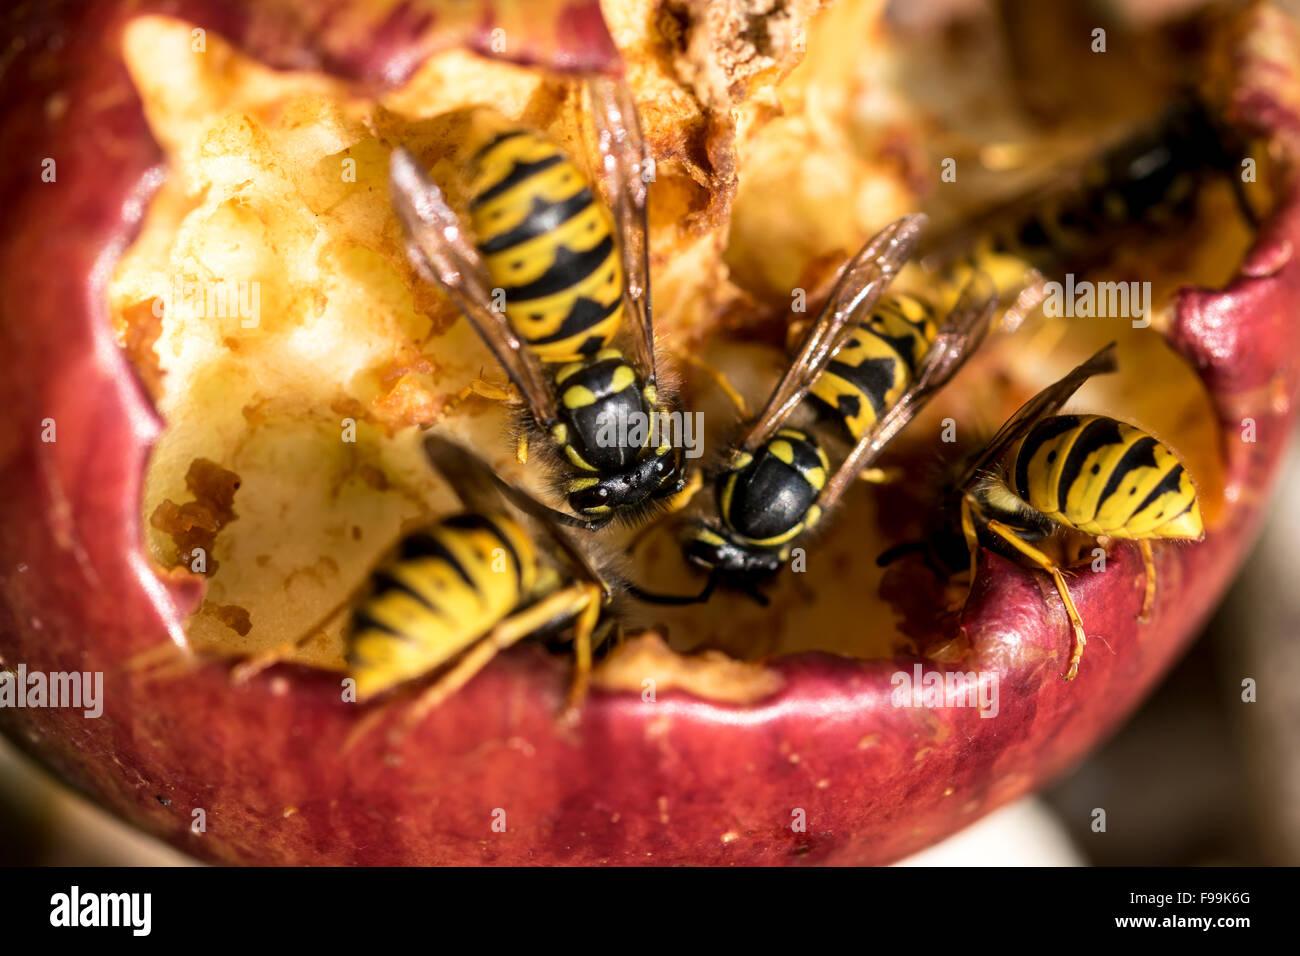 Common Wasp Vespula vulgaris feeding on sugars from a rotten garden apple - Stock Image